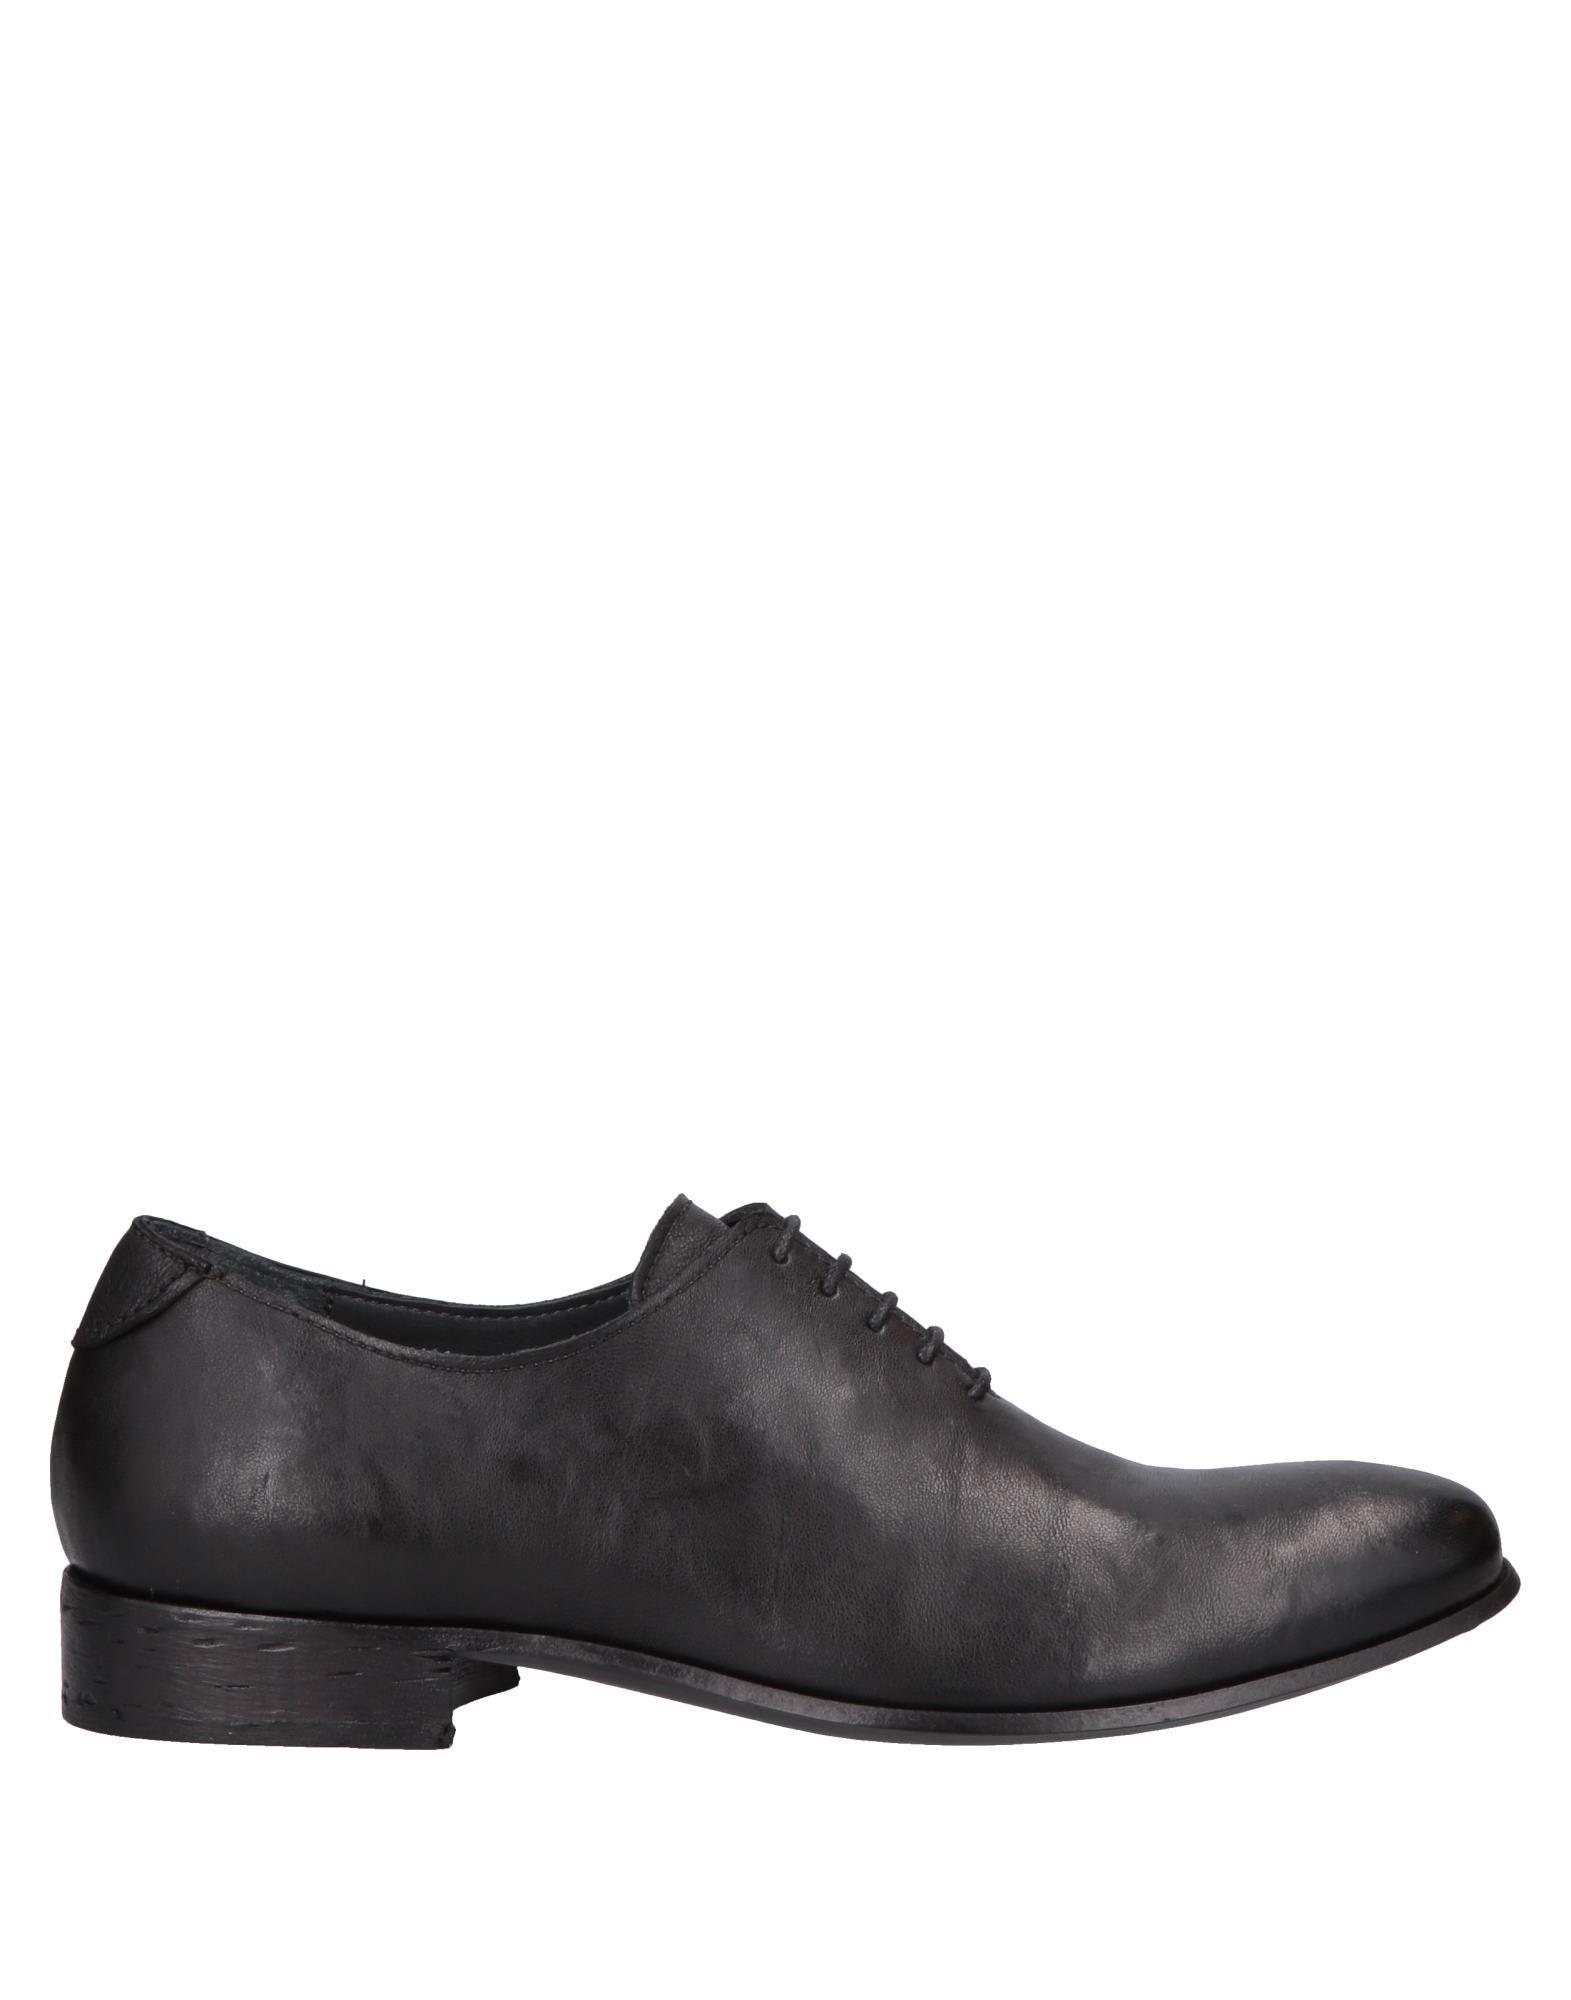 MR MASSIMO REBECCHI Обувь на шнурках детская кожаная обувь mr baby wa15 096 mr baby2015